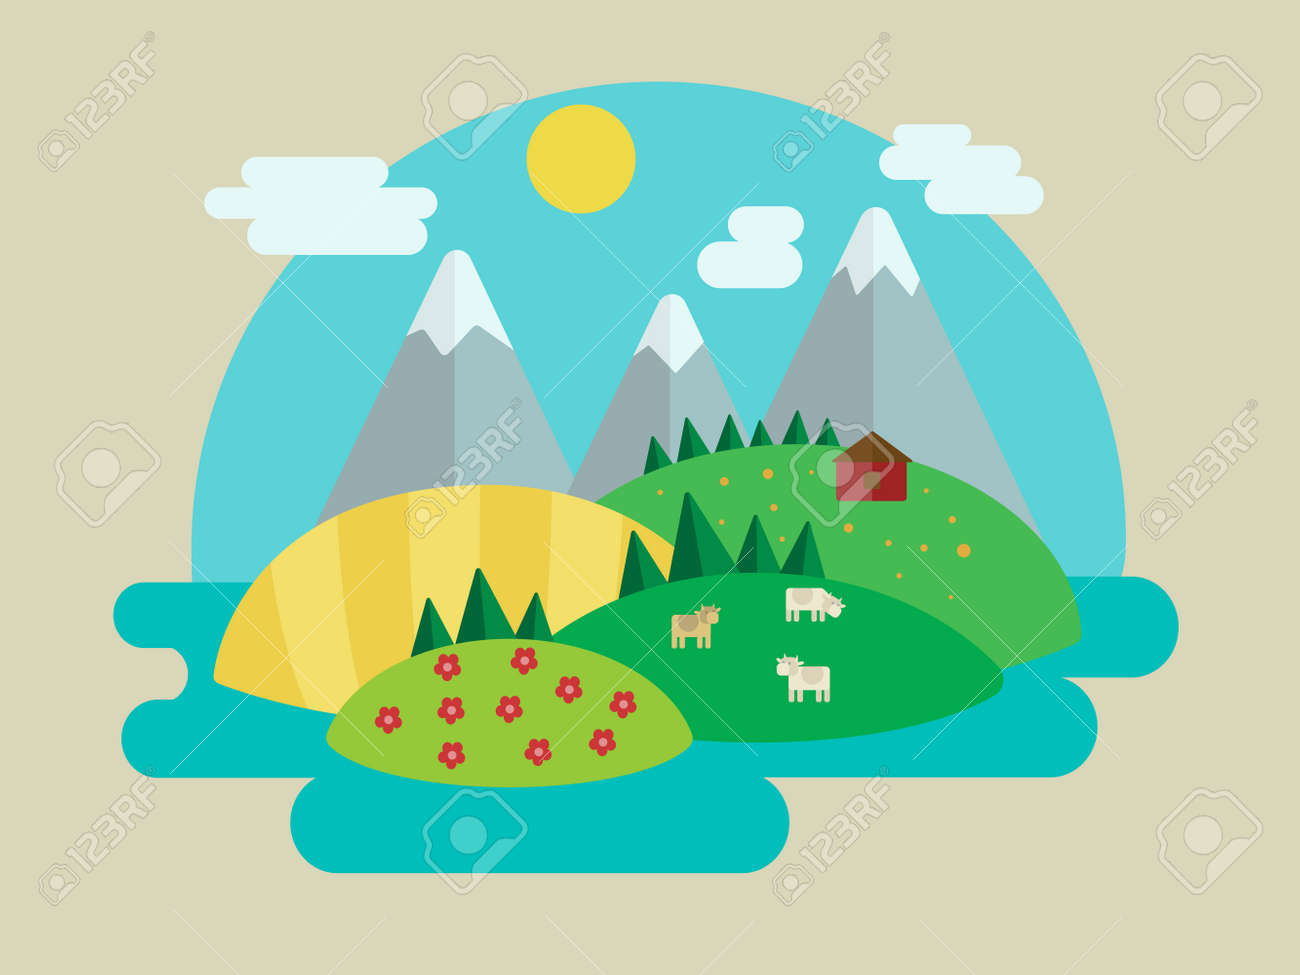 Paisagem Minimalista Natureza Ilustracao Vetorial Colorido Dos